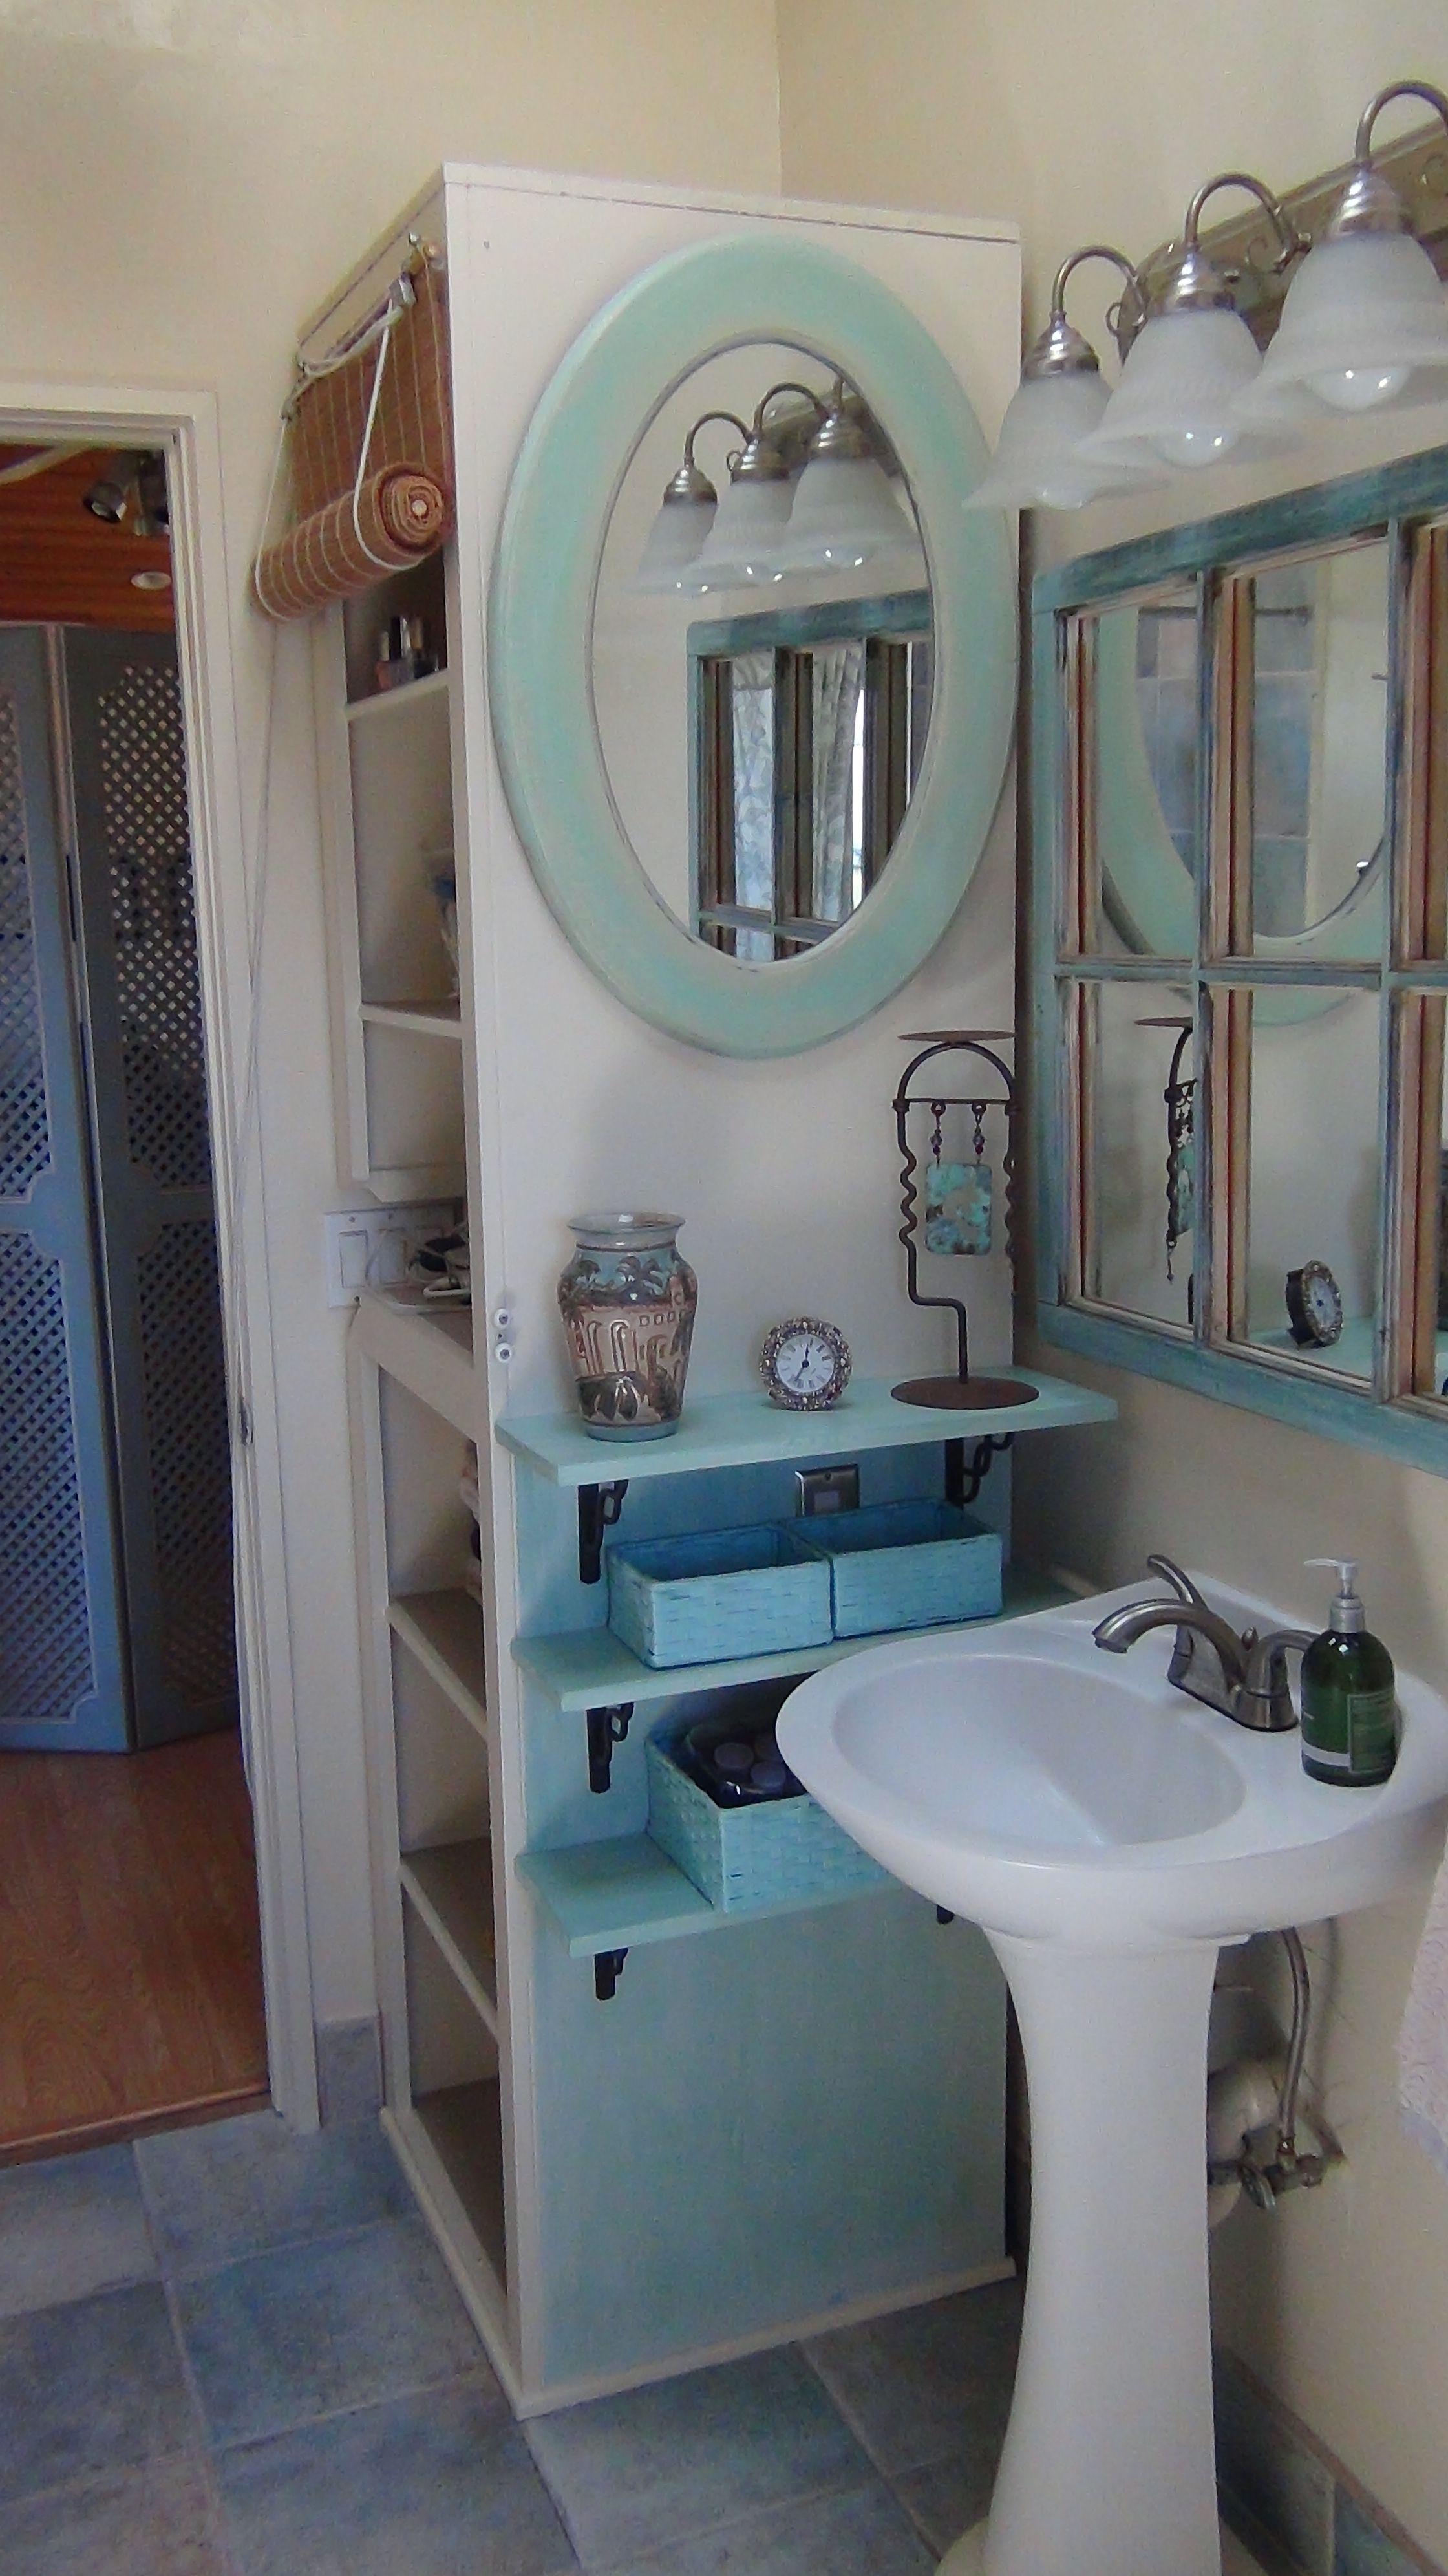 A Small Bathroom With A Pedestal Sink Means Little Counter Space - Bathroom pedestal sink storage cabinet for bathroom decor ideas